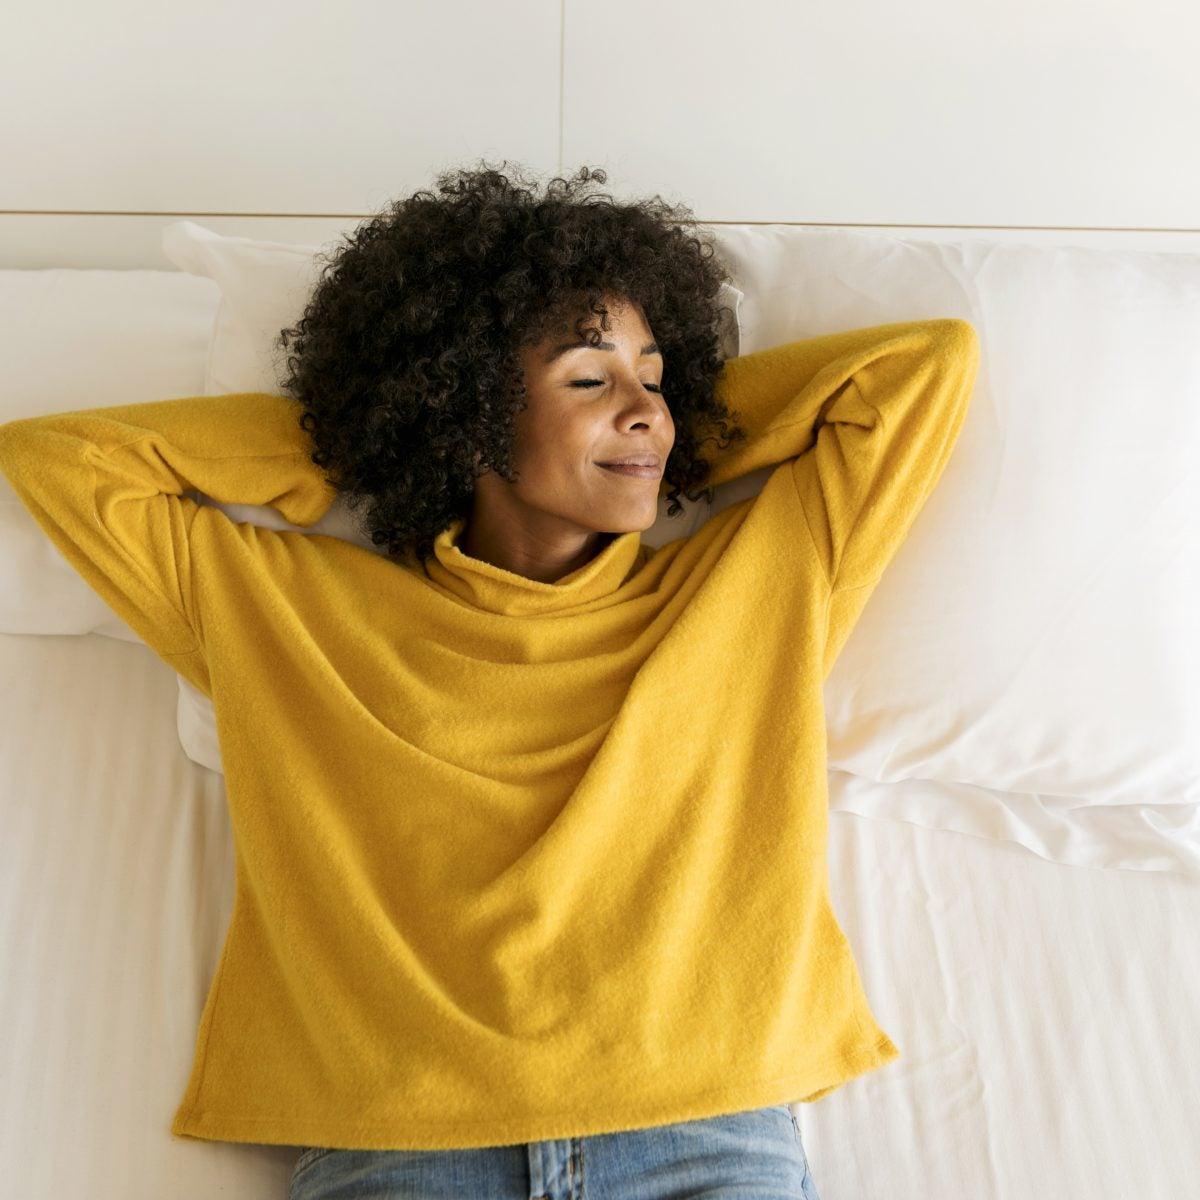 Meet The Black Woman 'Selling Sleep' To Help You Work Better